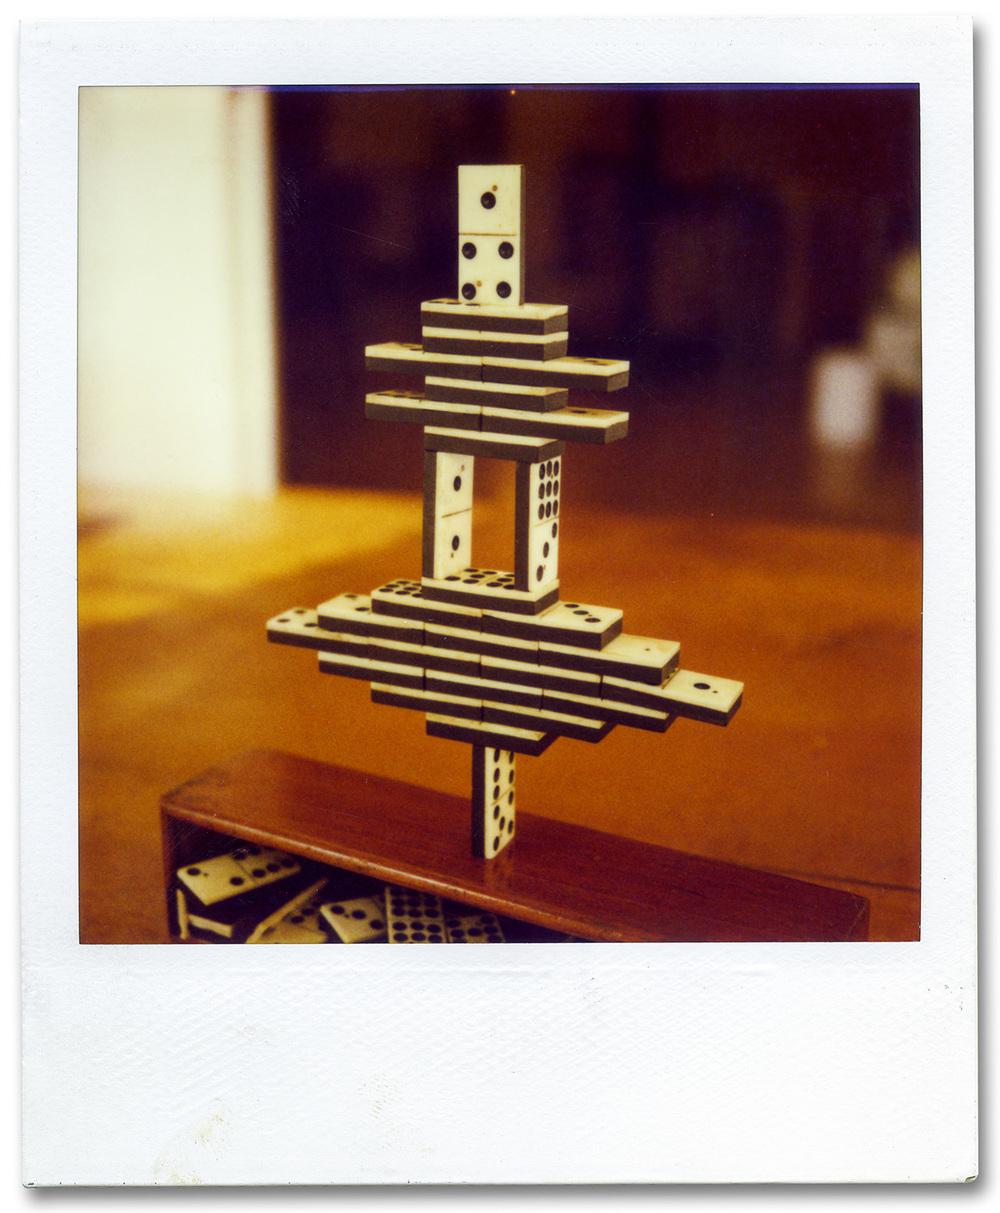 SX-70 Polaroid, ©1988 Walter Wick